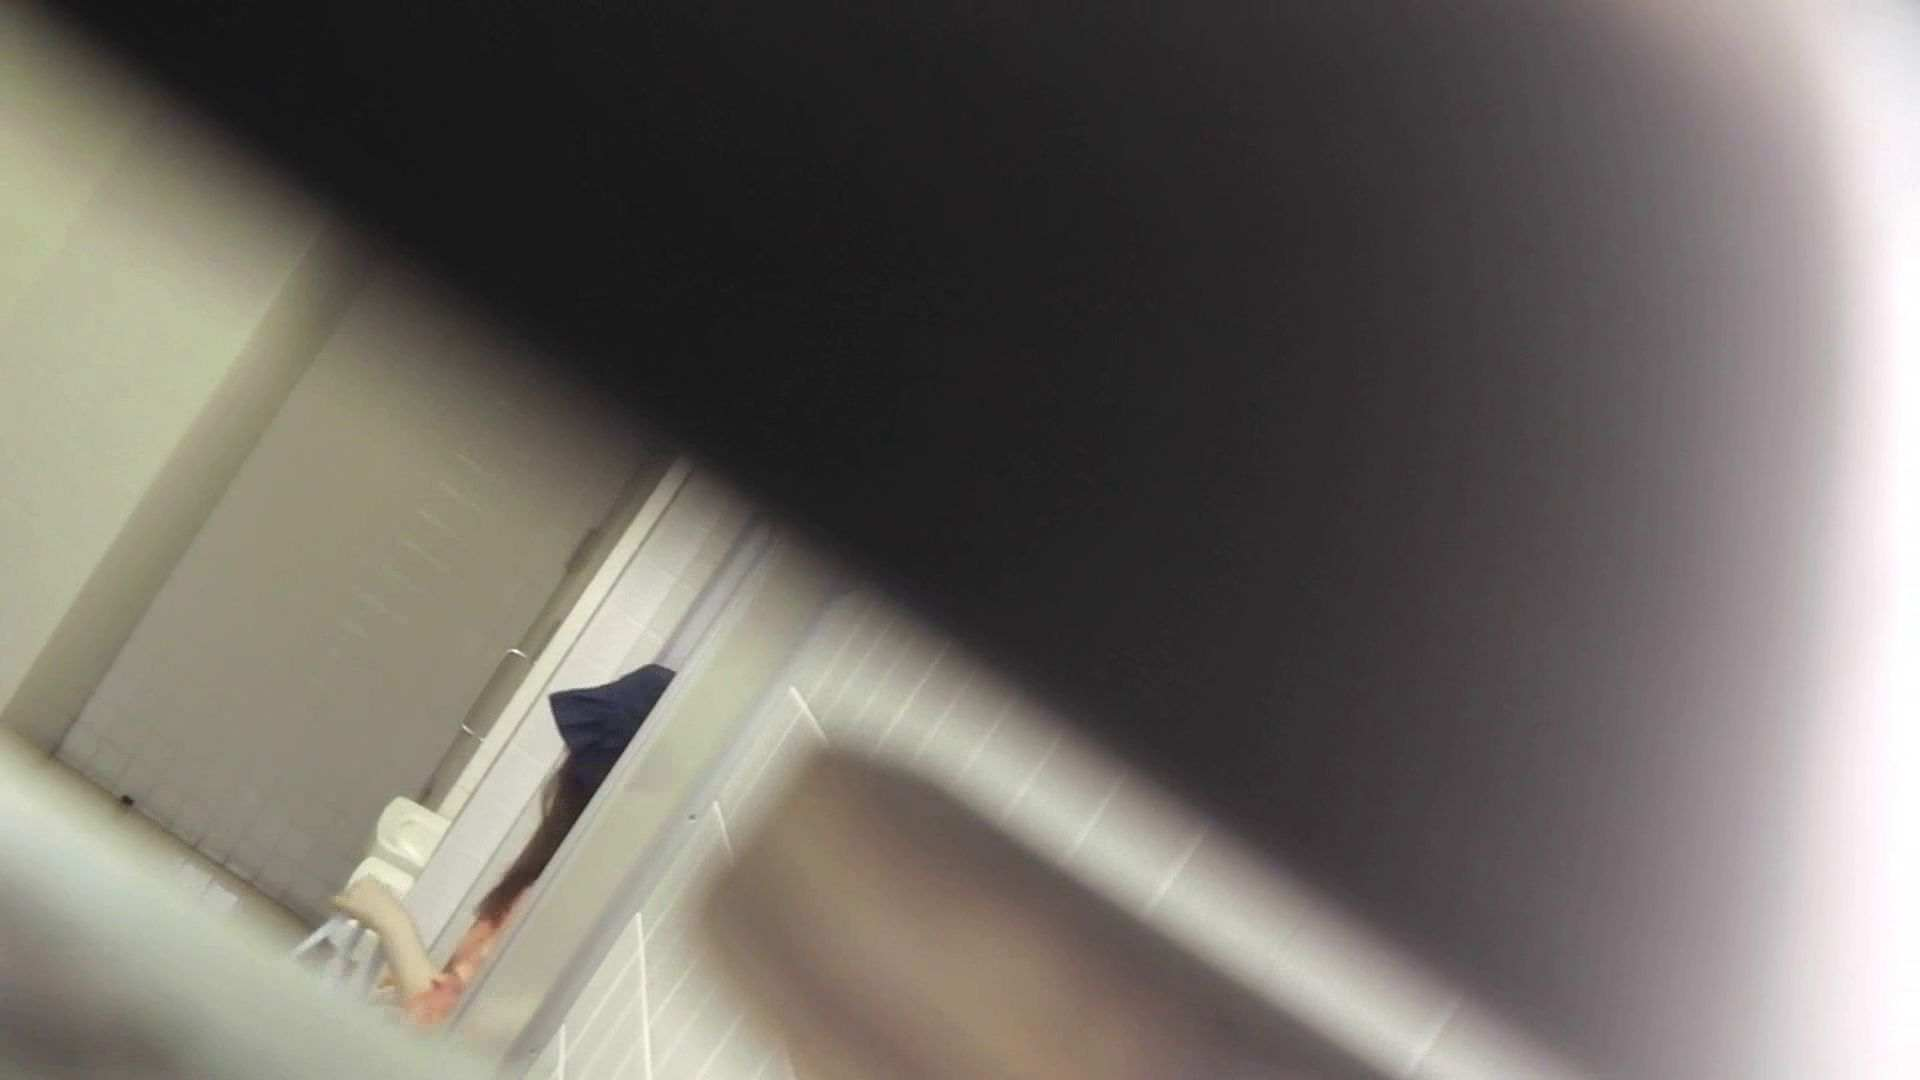 vol.27 命がけ潜伏洗面所! 小嶋陽菜似のピンクオシャレさん 美人 アダルト動画キャプチャ 78pic 8